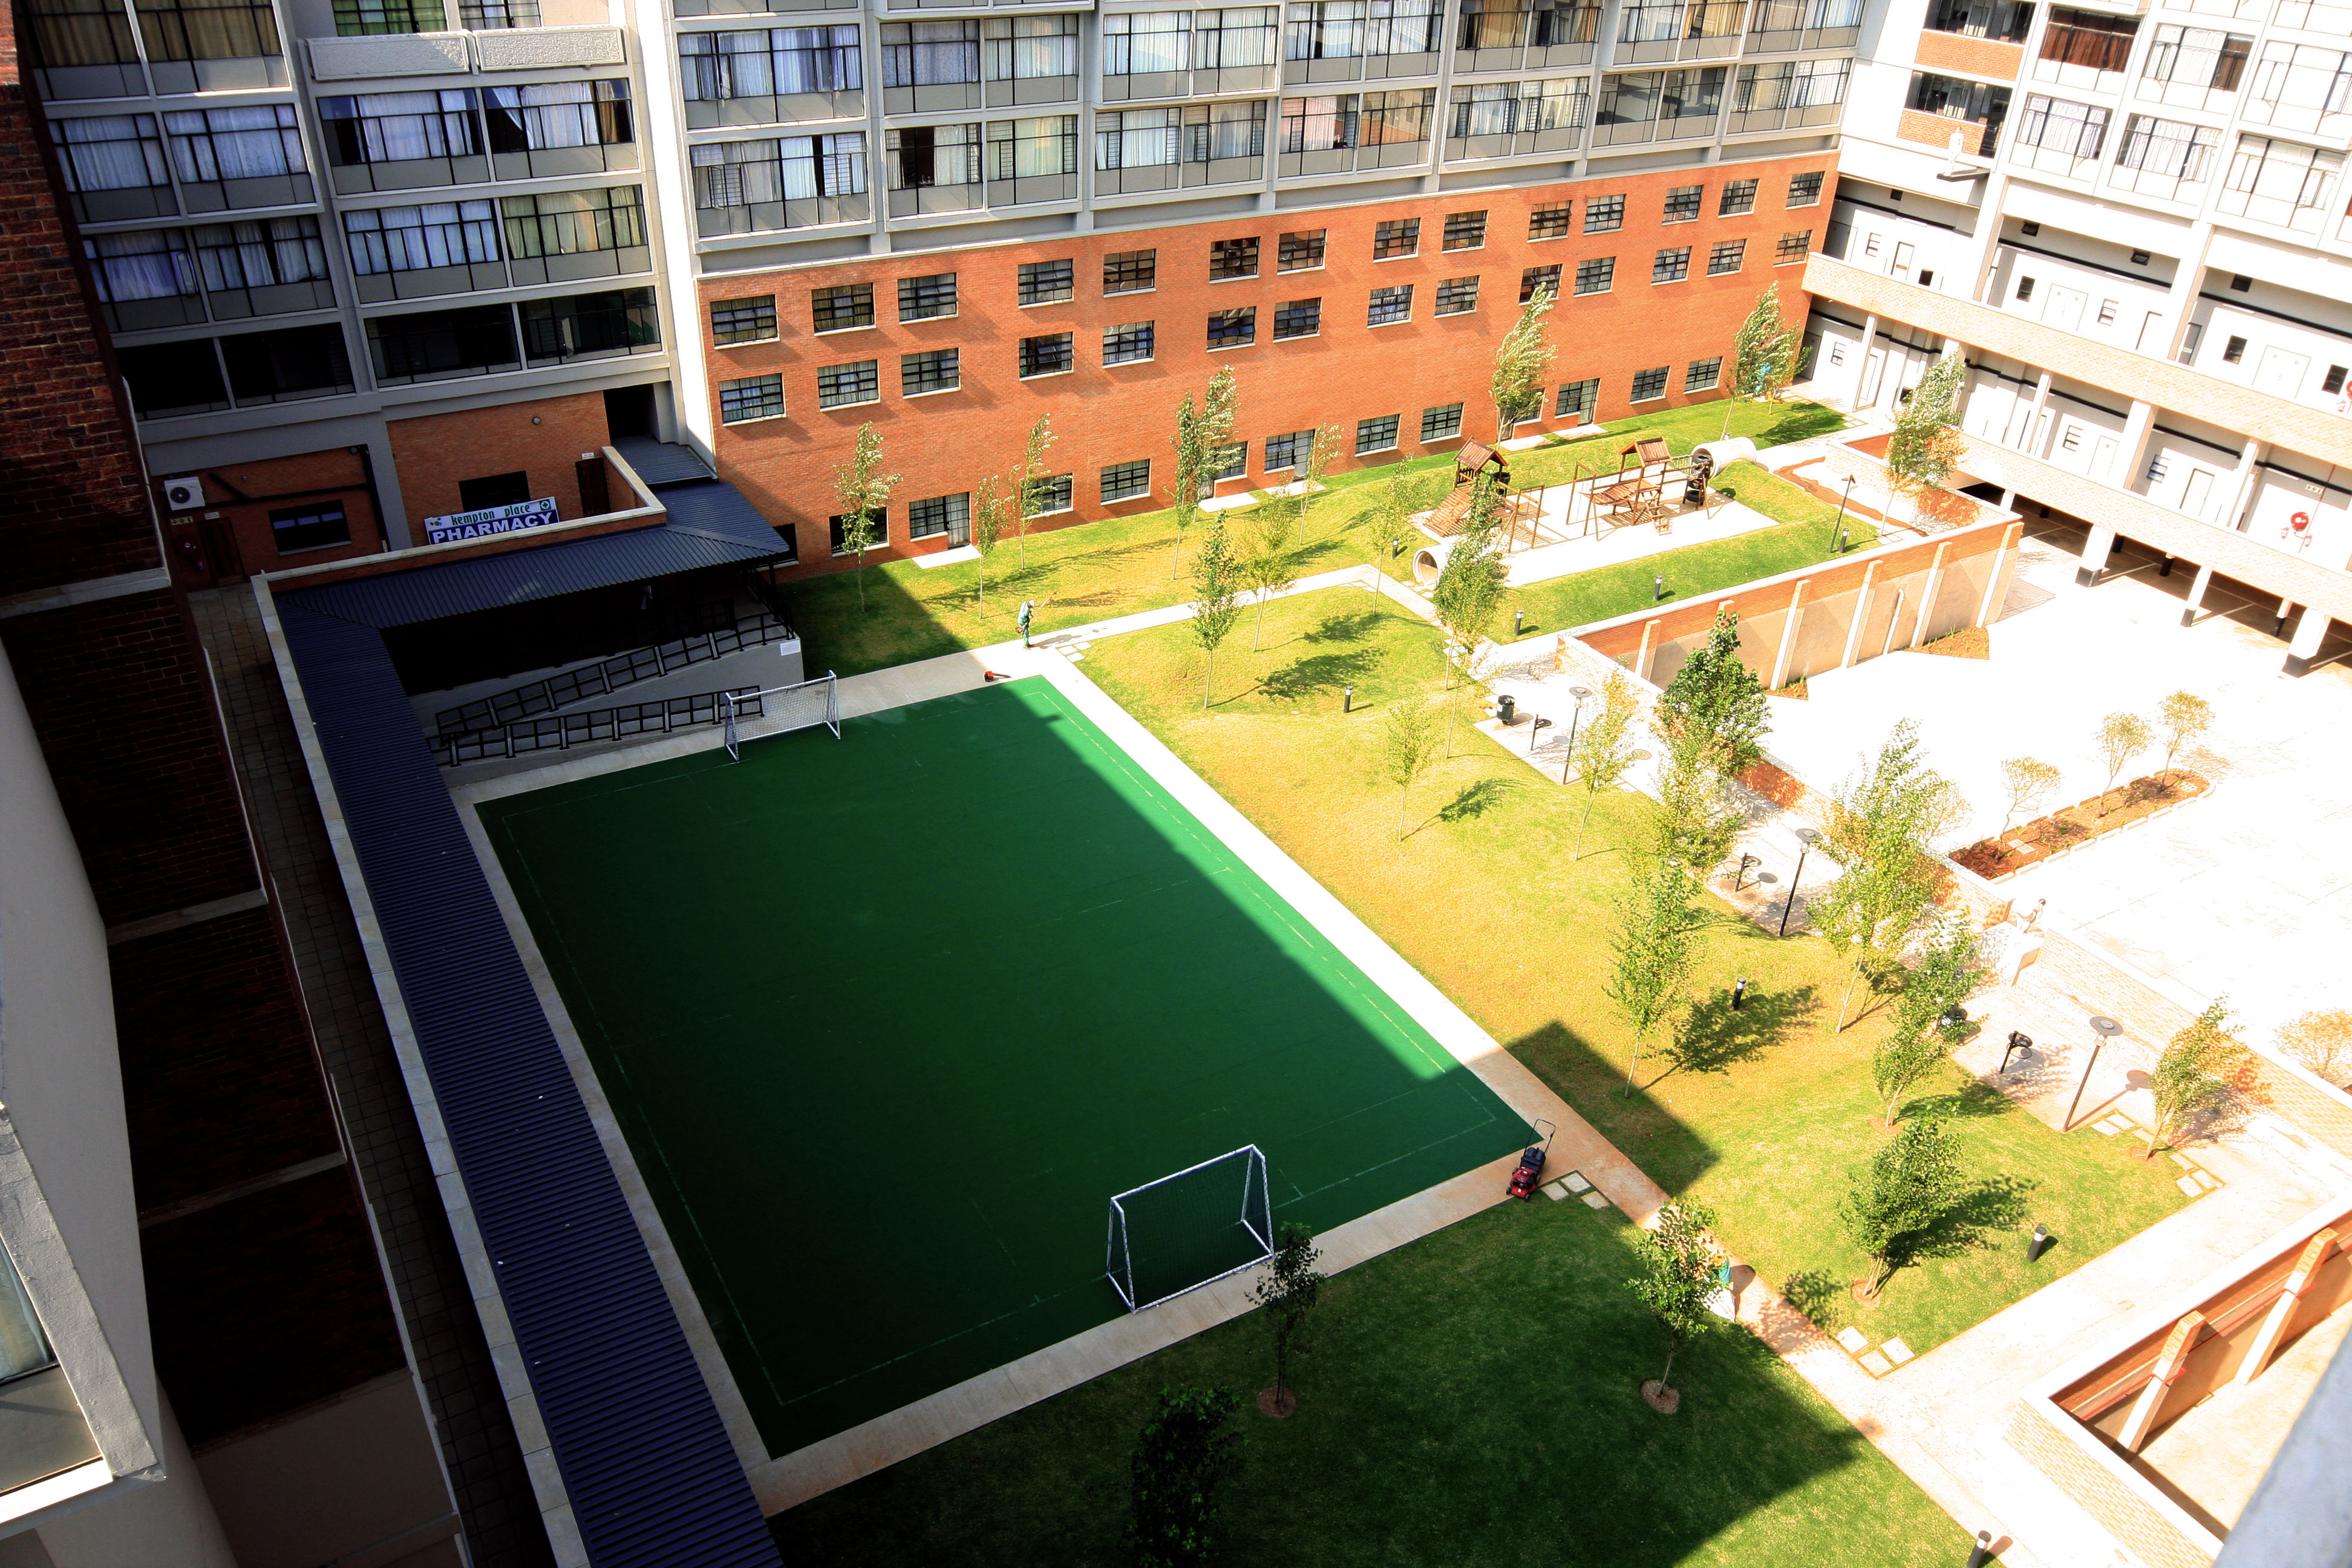 kempton_internal courtyard 3